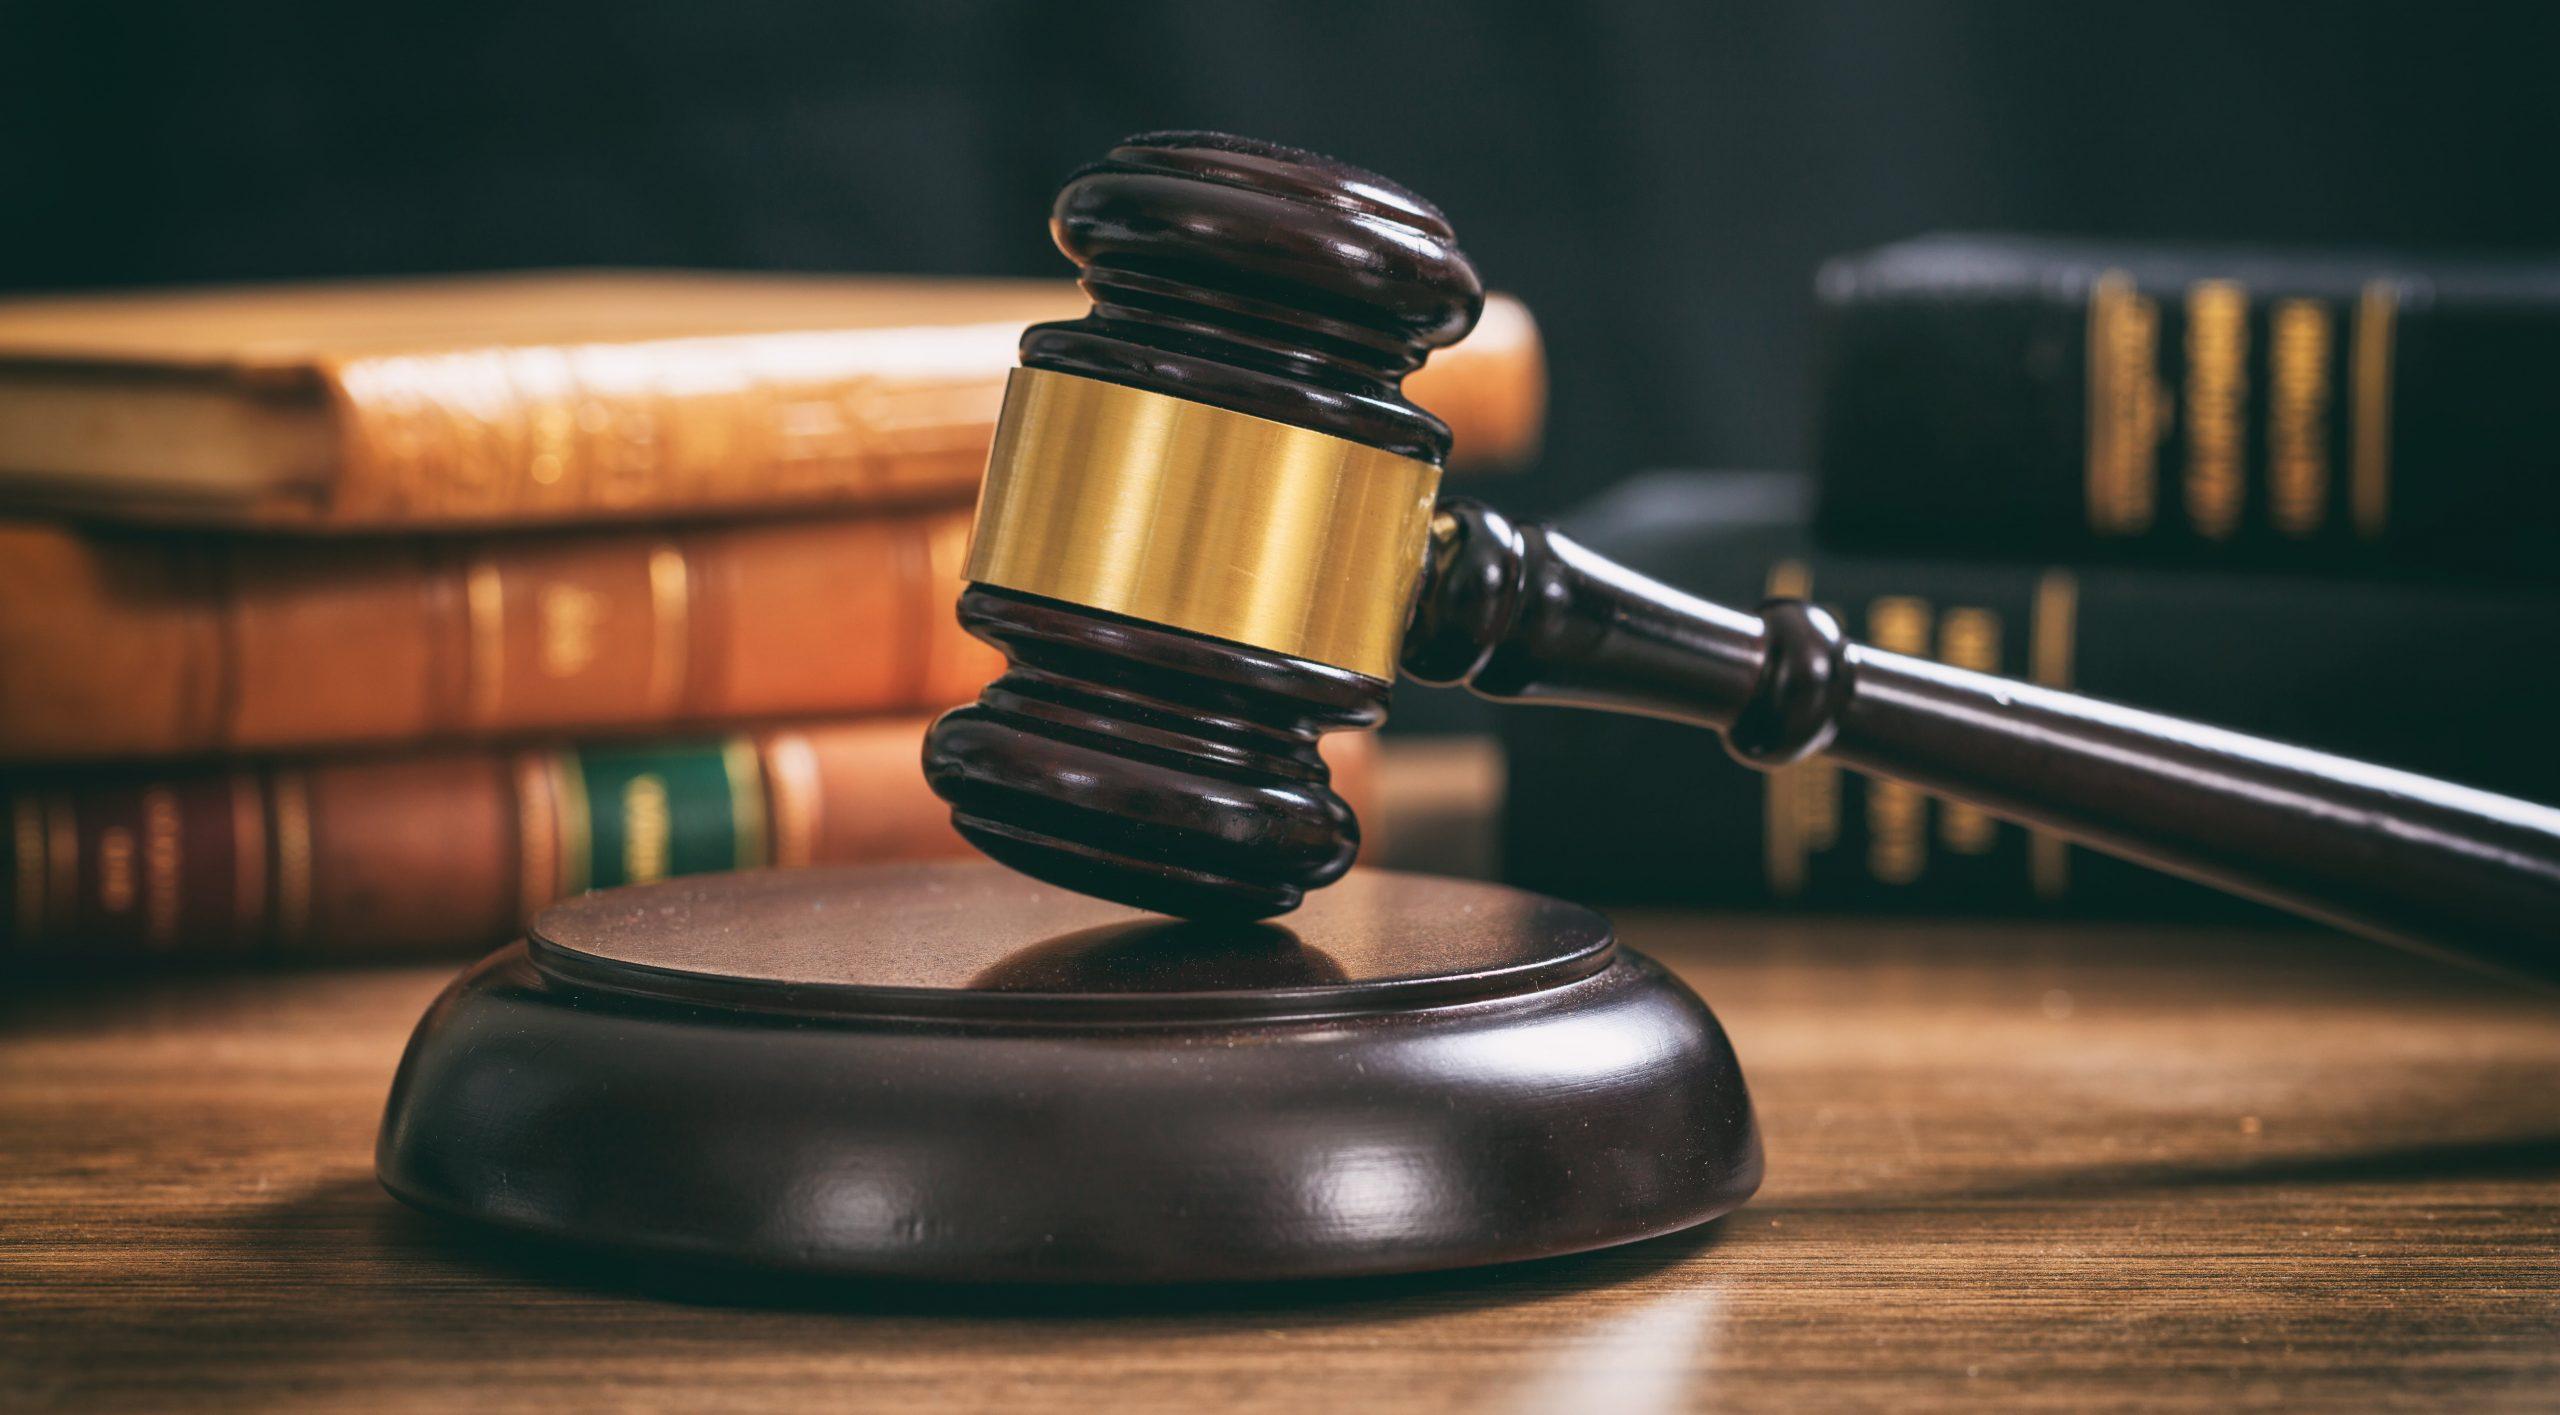 judge-gavel-on-a-wooden-desk-law-books-background-PLECUPQ-min